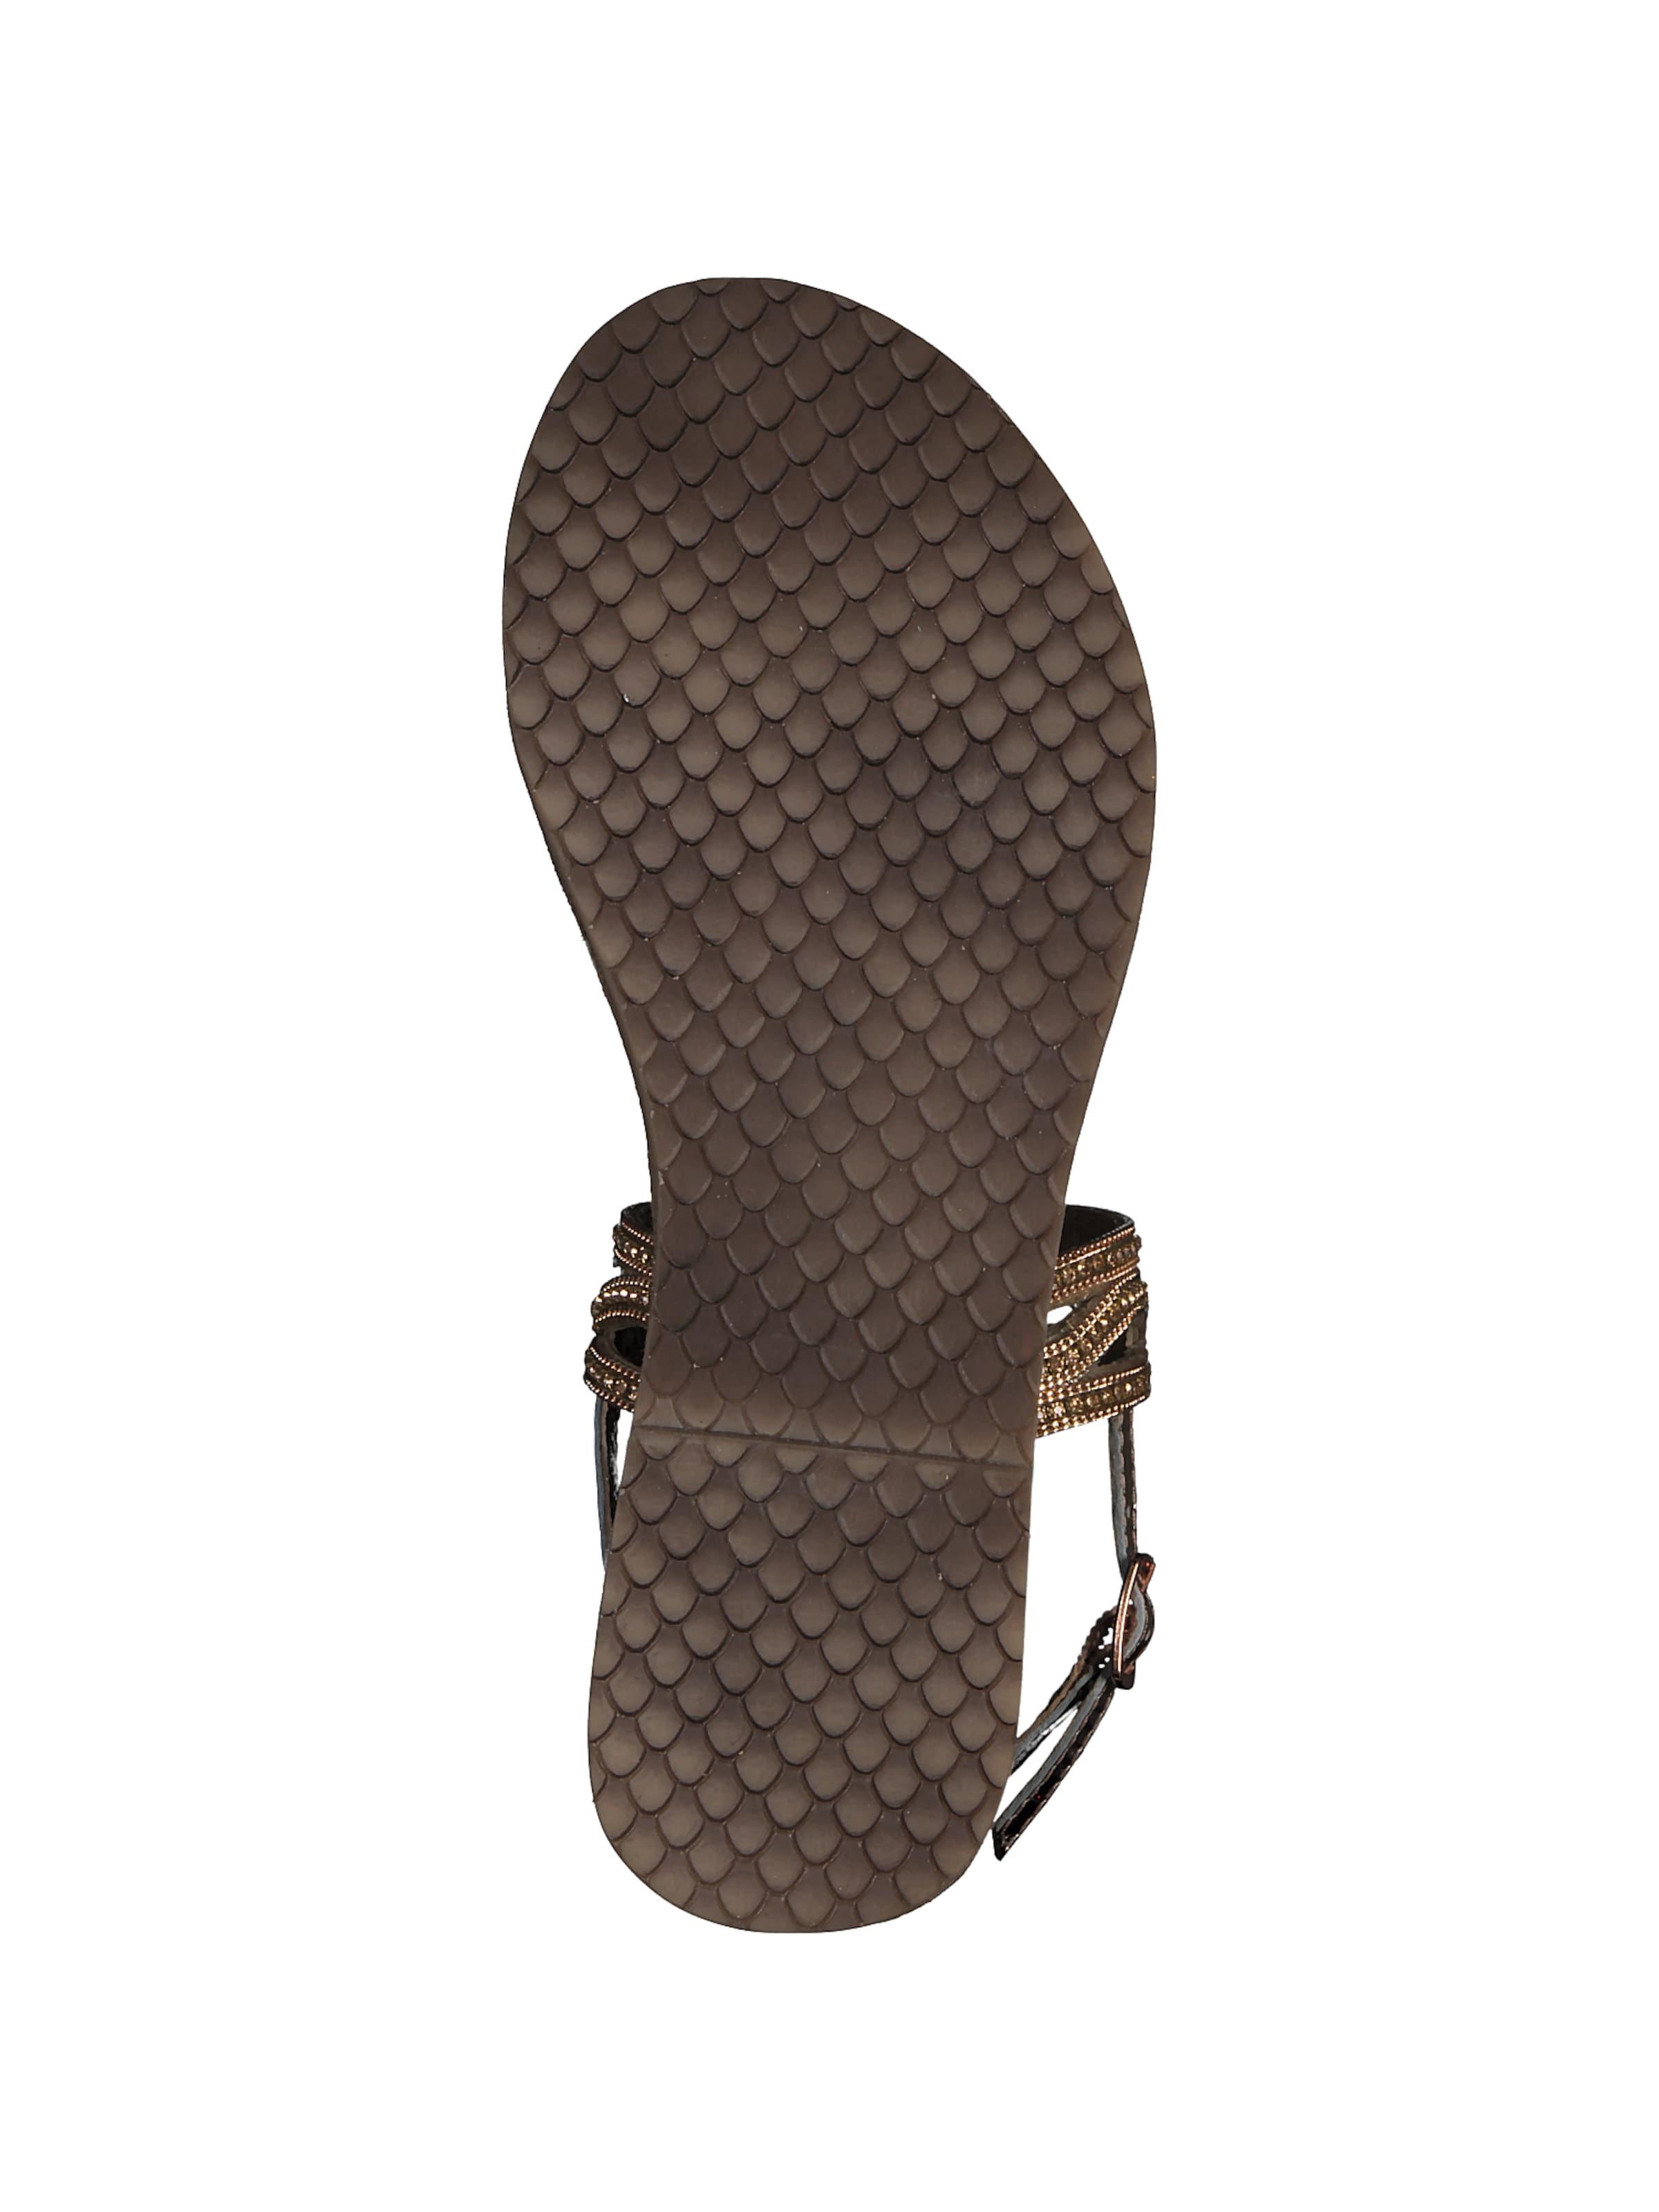 Sandale' Tamaris In DamenSandalen 'strappy Gold 0knwO8NPX